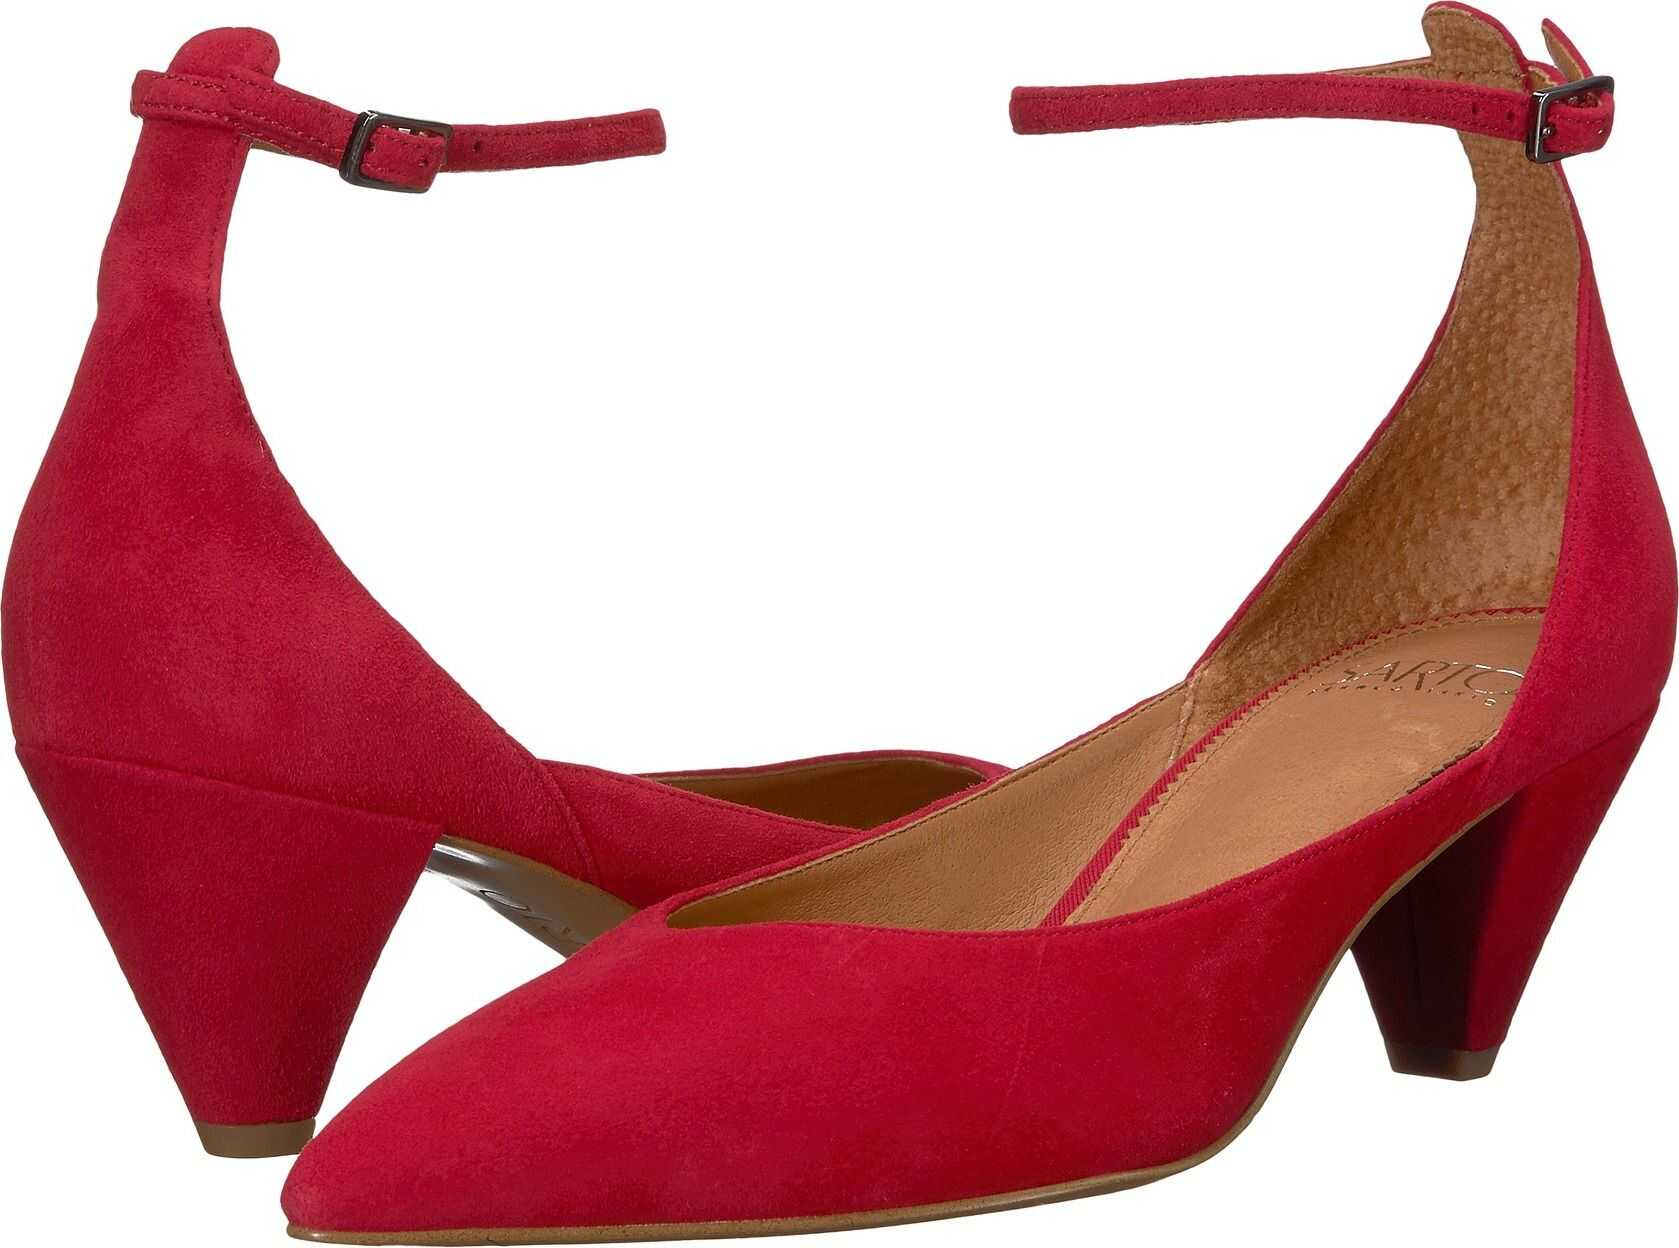 Franco Sarto Coralie Cherry Suede Leather